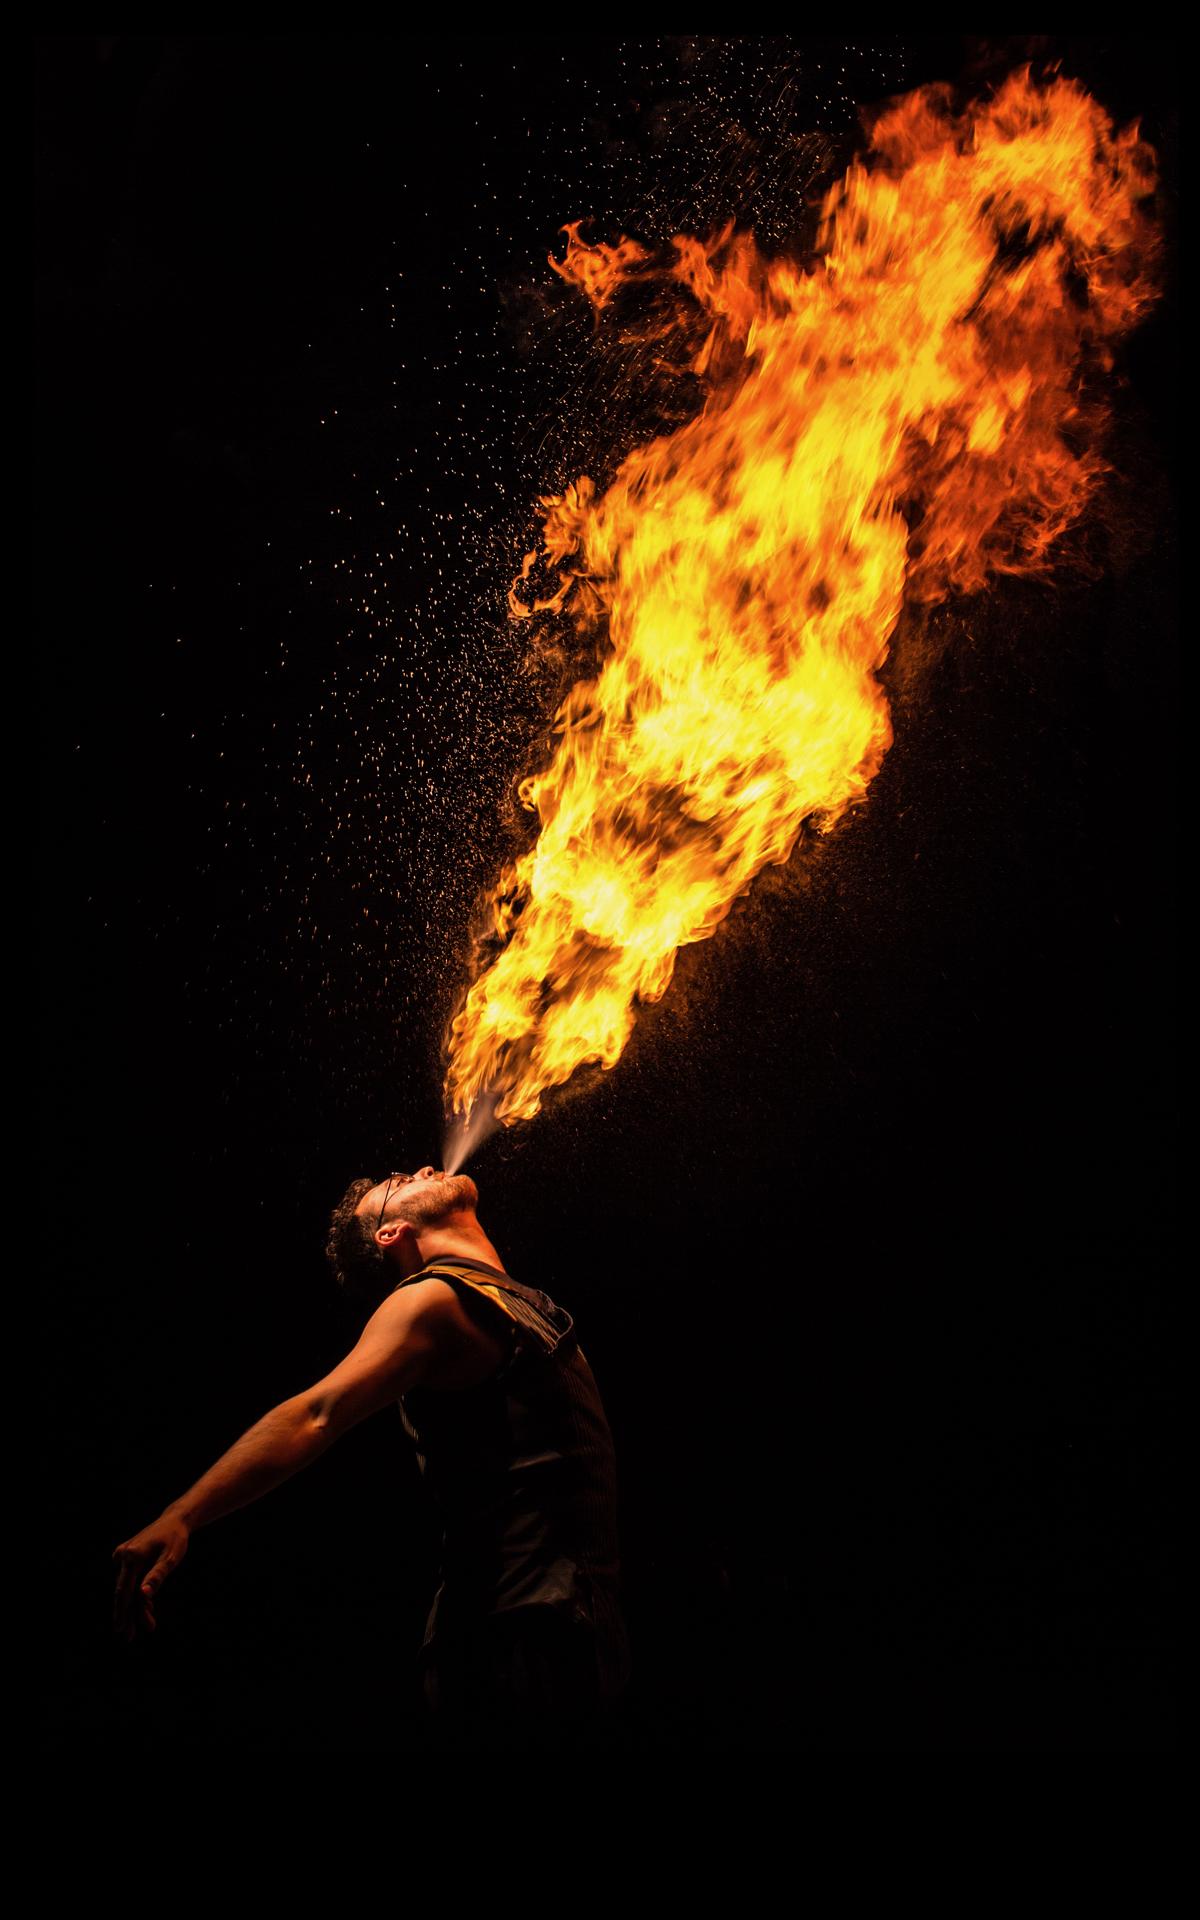 Sunshine Fire Entertainment detroit fire breather - 1 (2).jpg